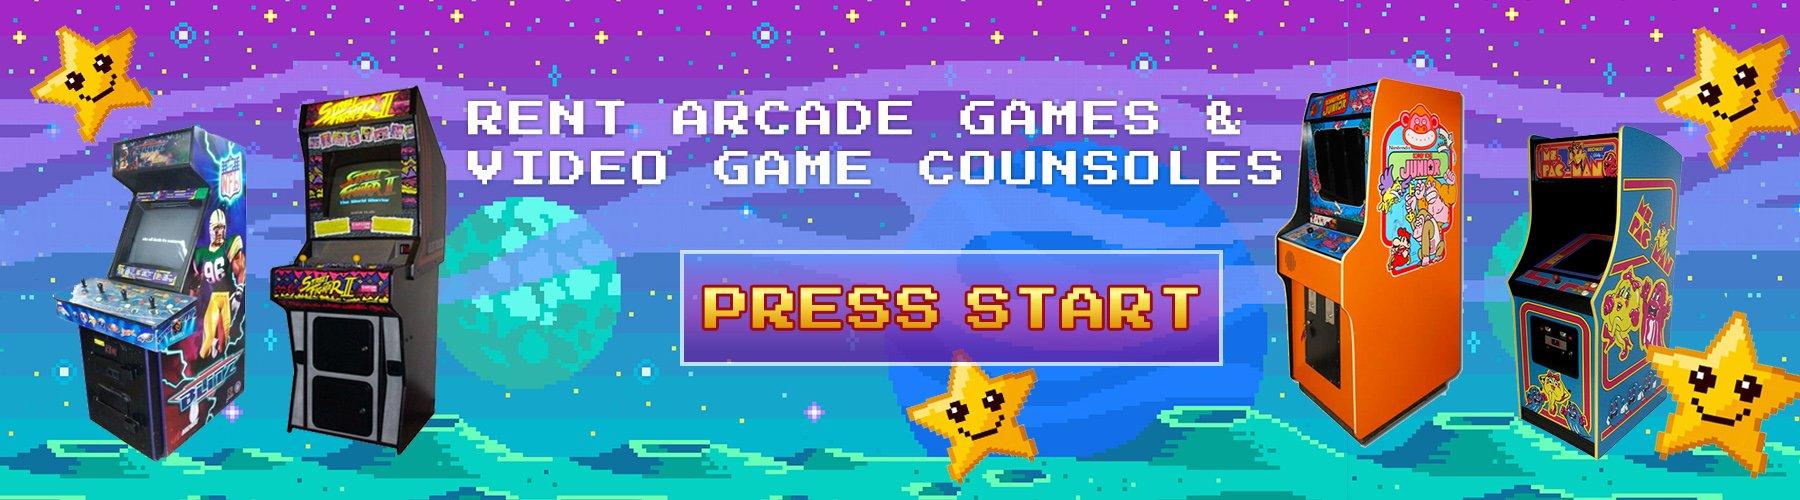 Arcade slide (final)